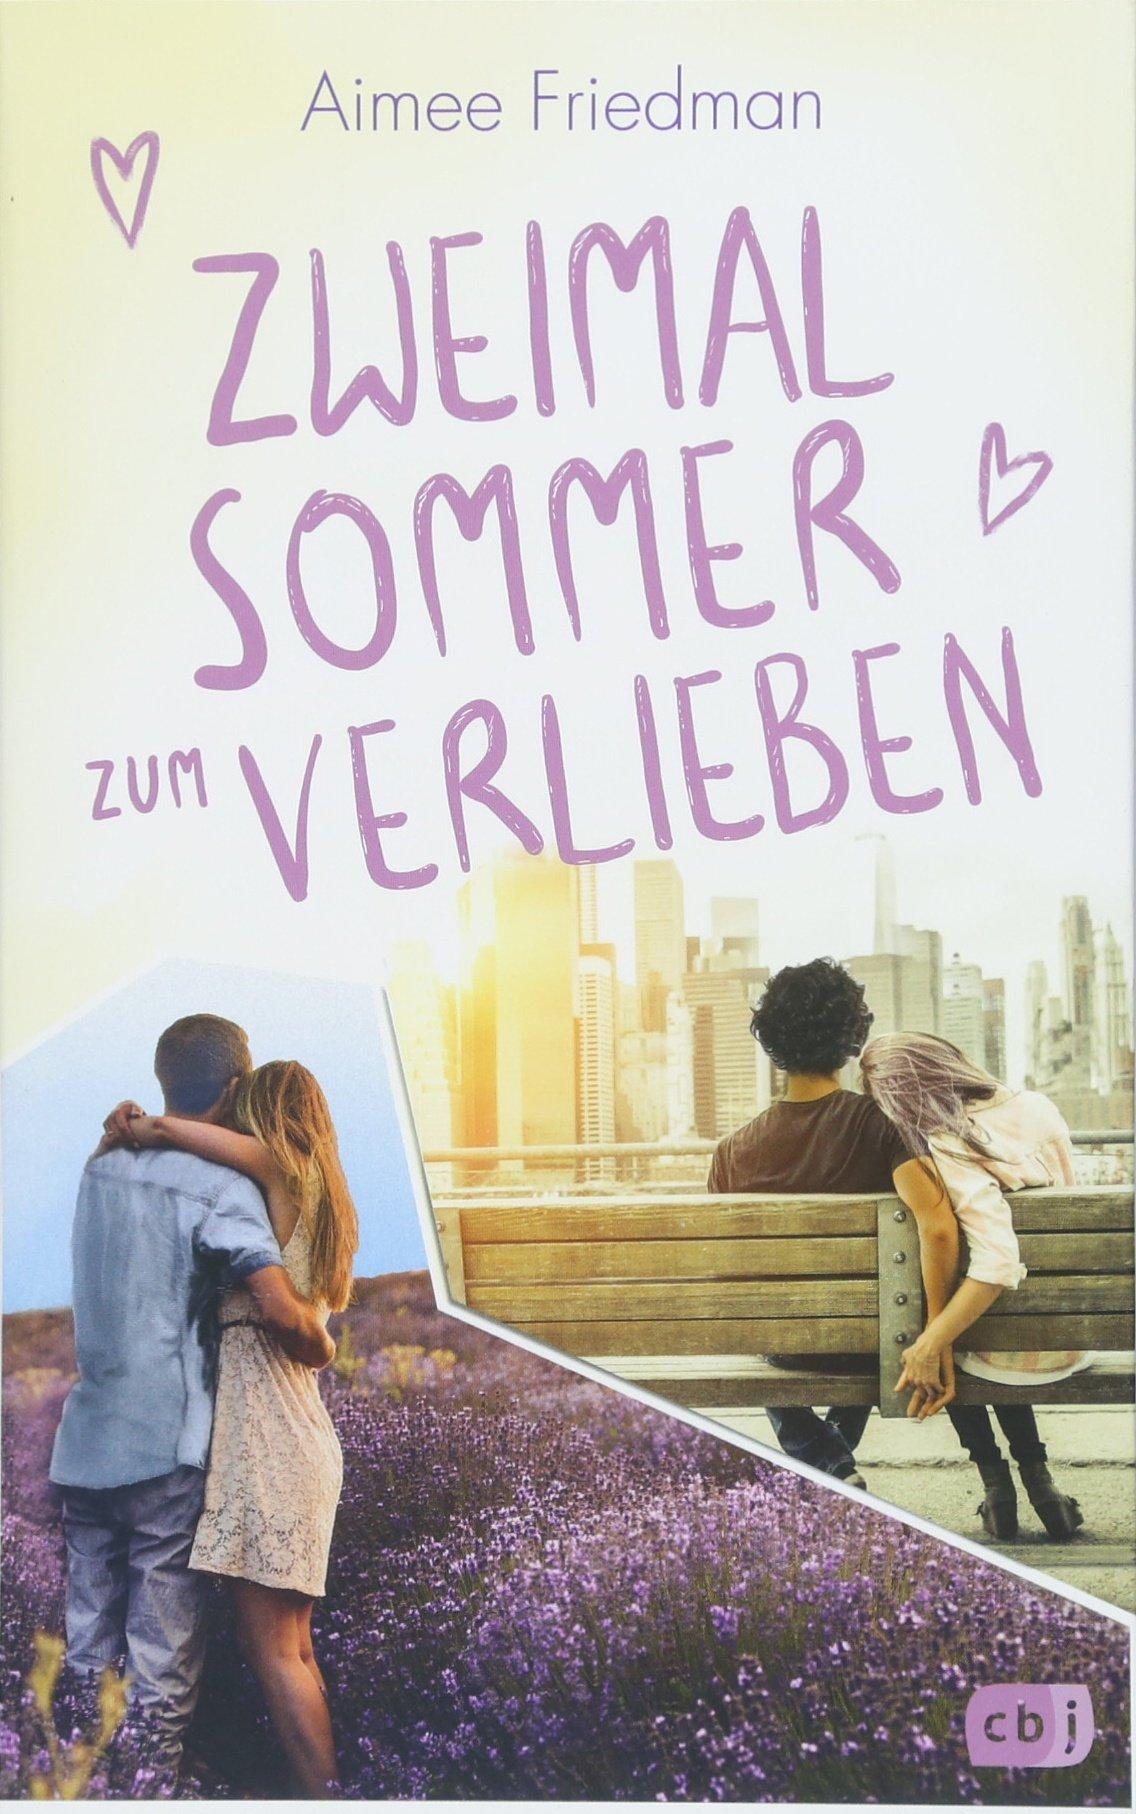 Zweimal Sommer zum Verlieben Broschiert – 29. Mai 2018 Aimee Friedman Catrin Frischer cbj 3570165116